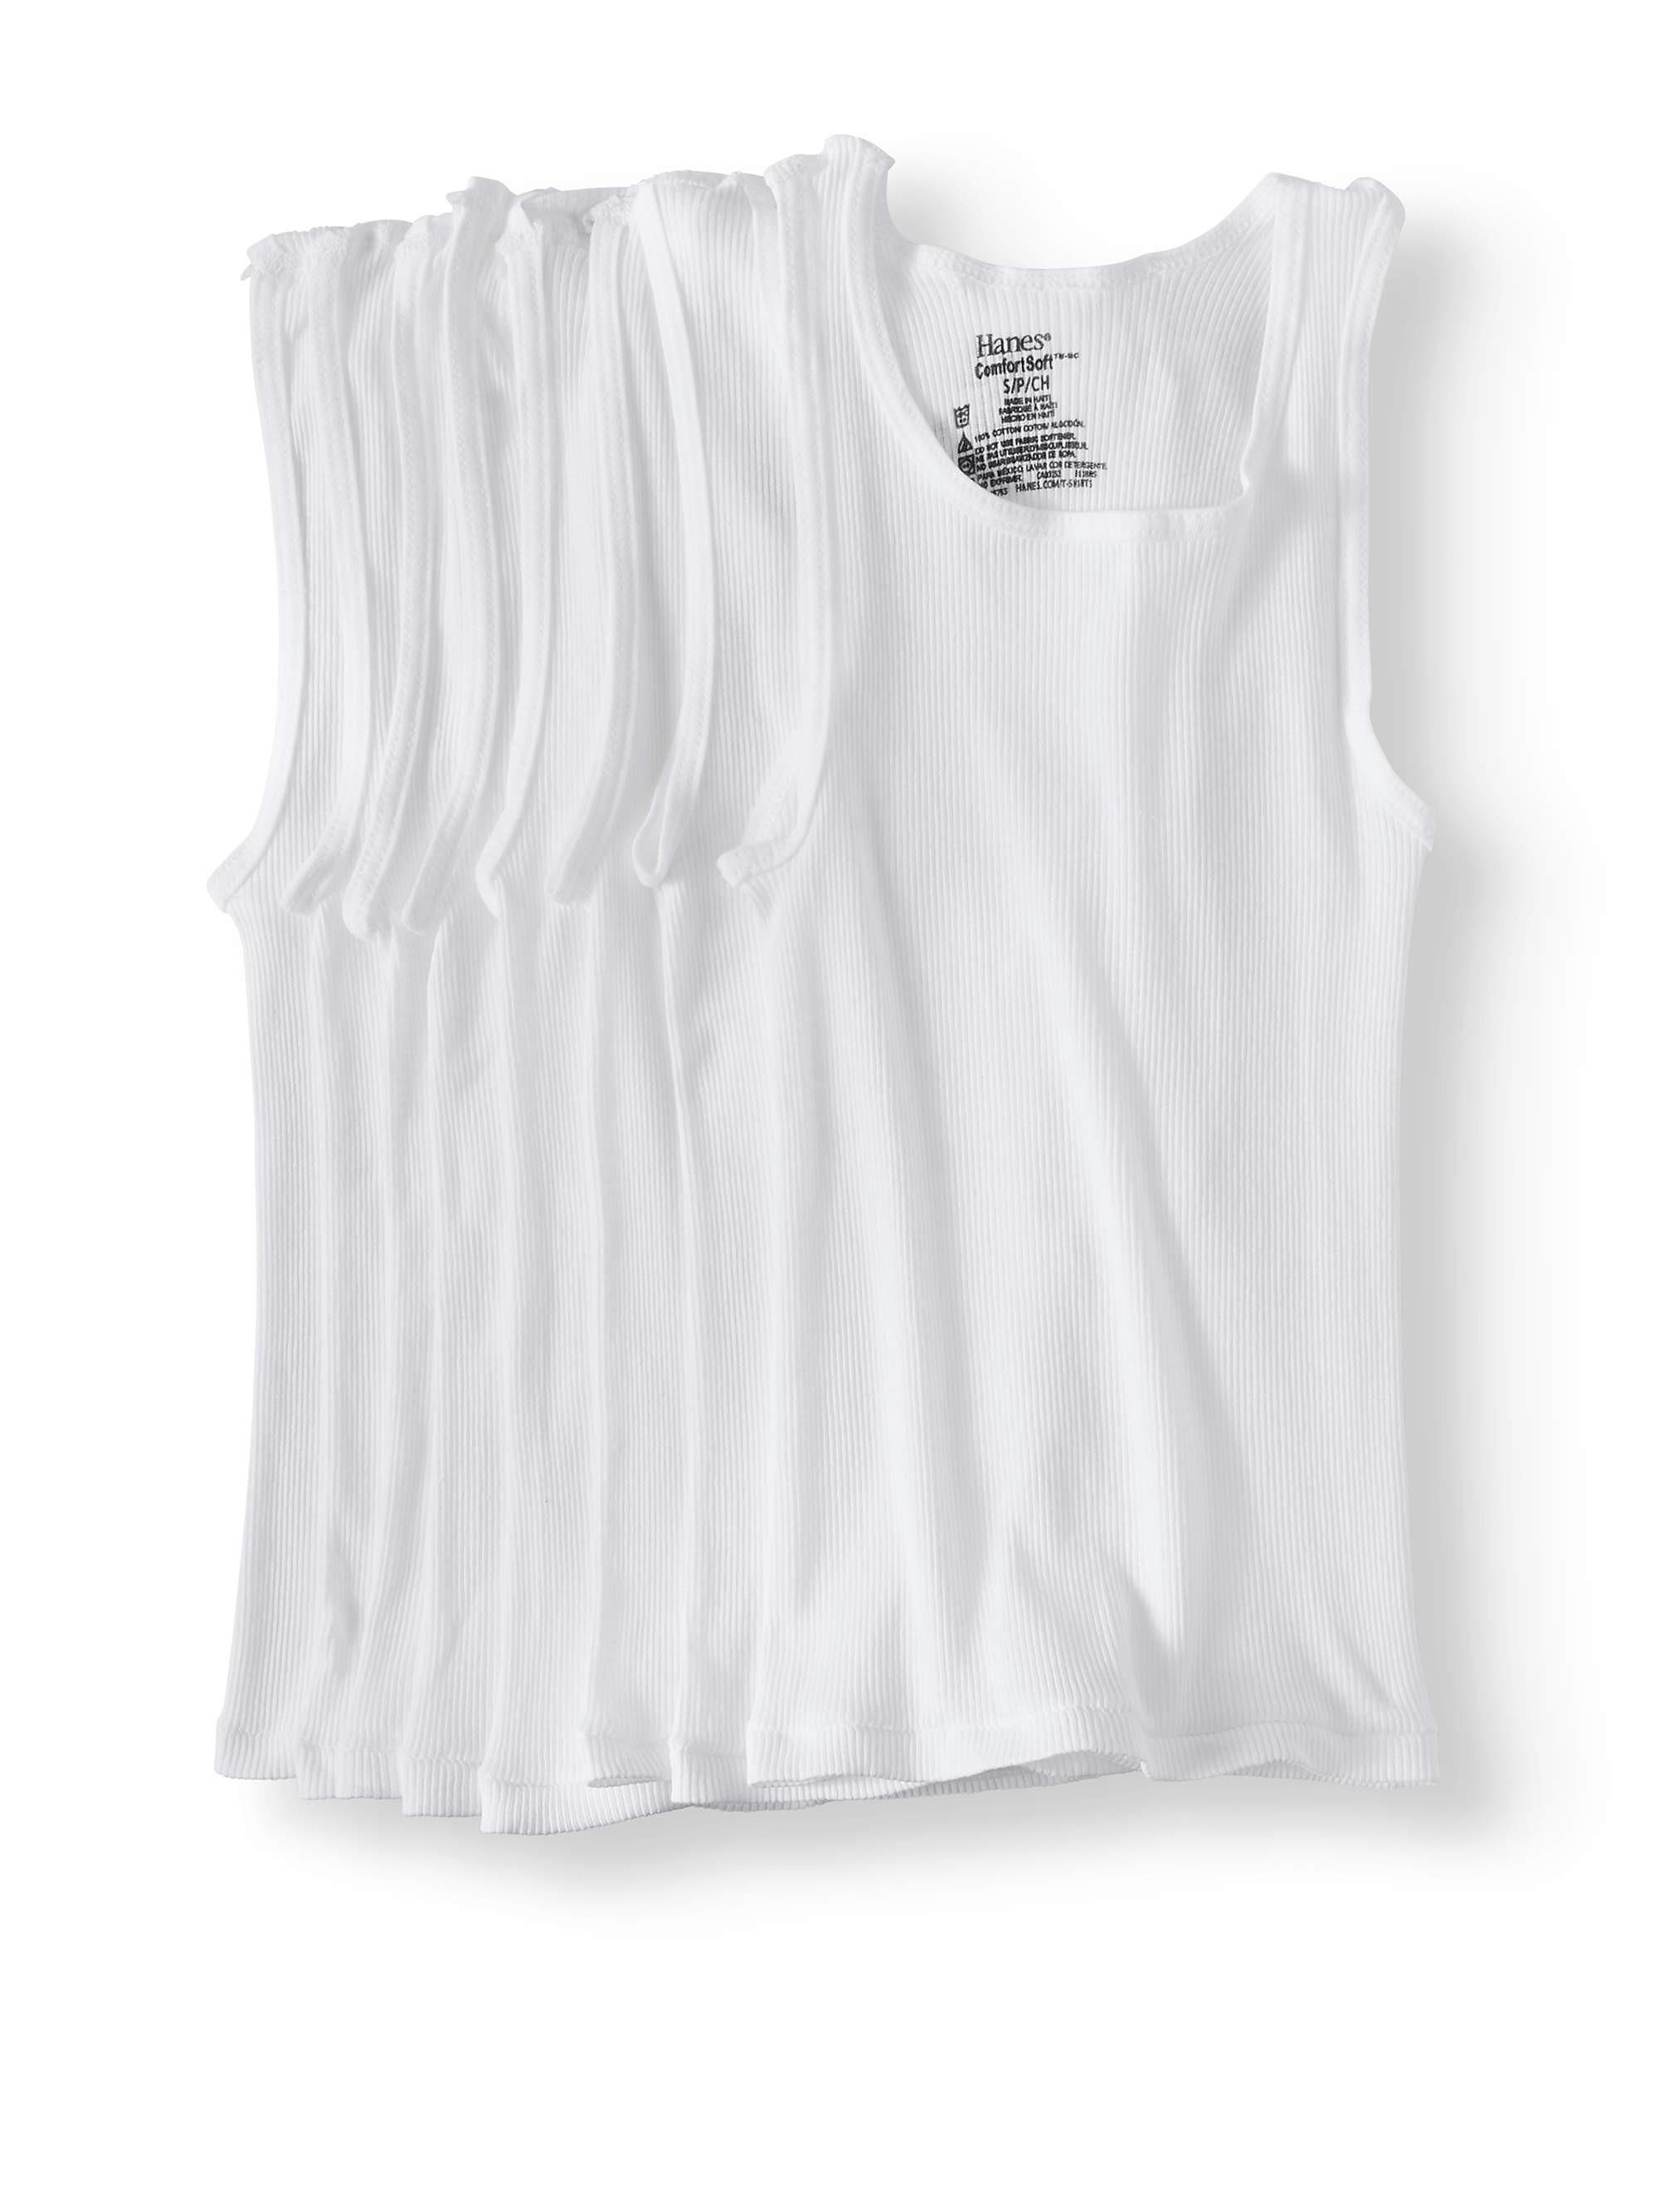 Est. 1 Pallet of Hanes Boys' Multi-Pack Tank Top Undershirts & Boxers, 151 Packs, Ext. Retail $1,735, Winston Salem, NC